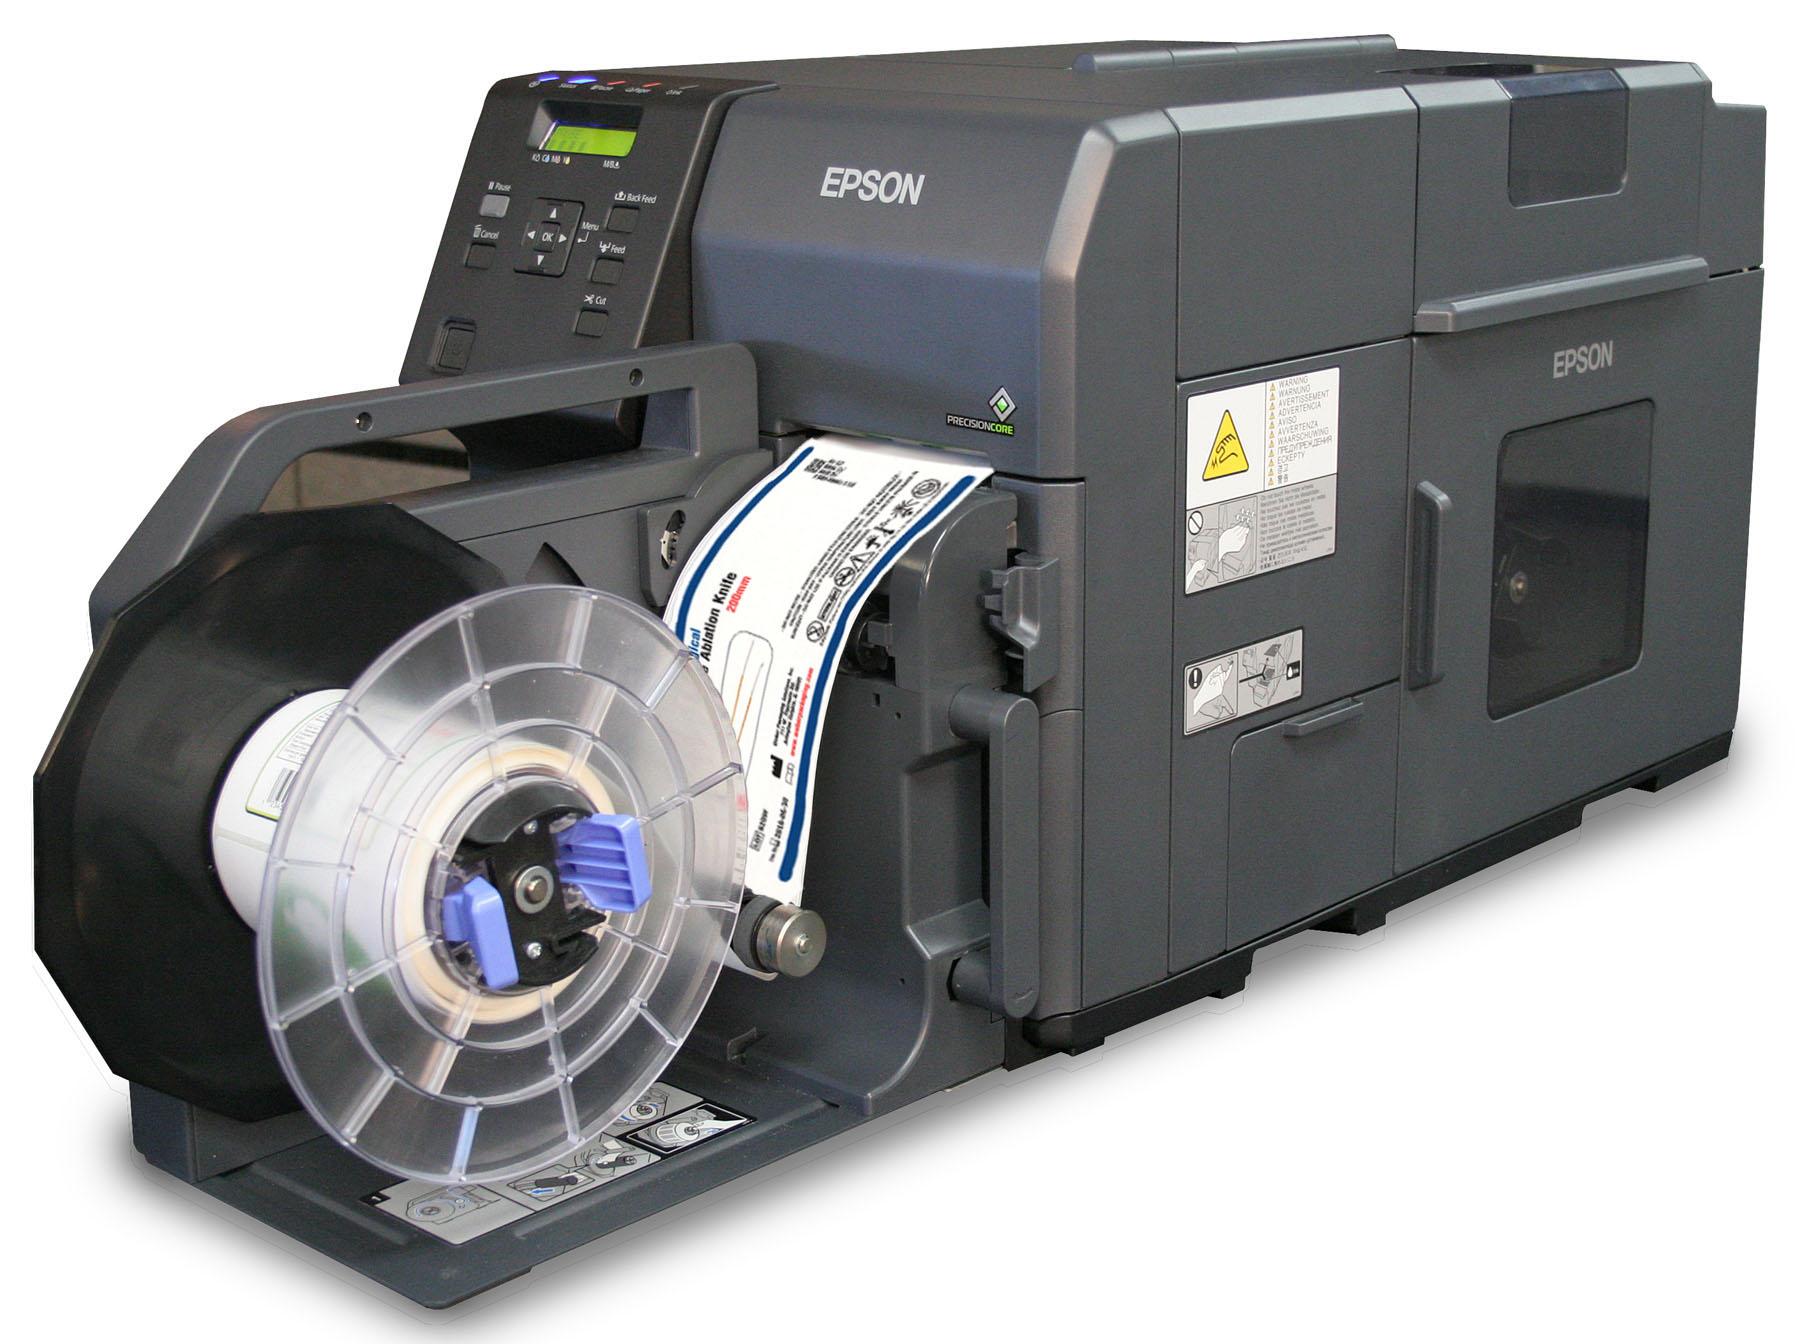 Color printer label - Epson C7500 High Speed Label Printer